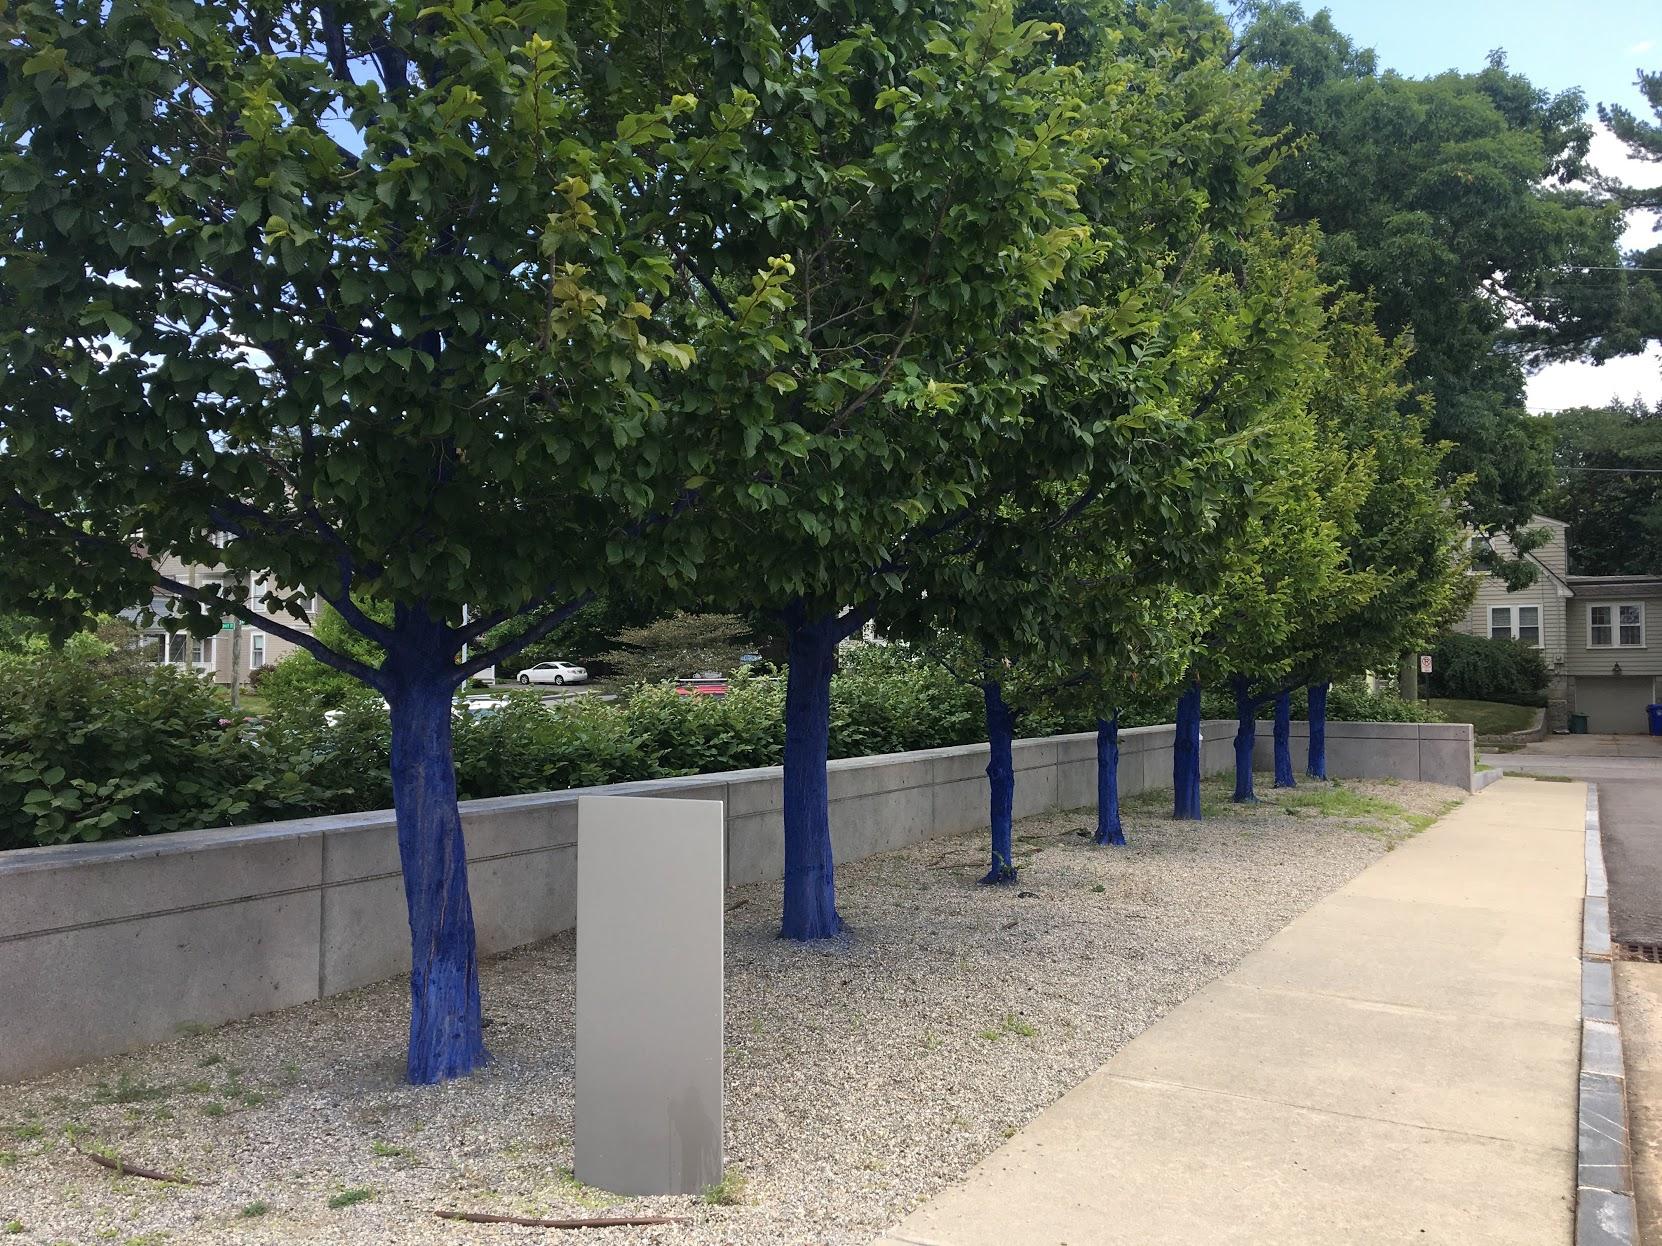 Blue trees!